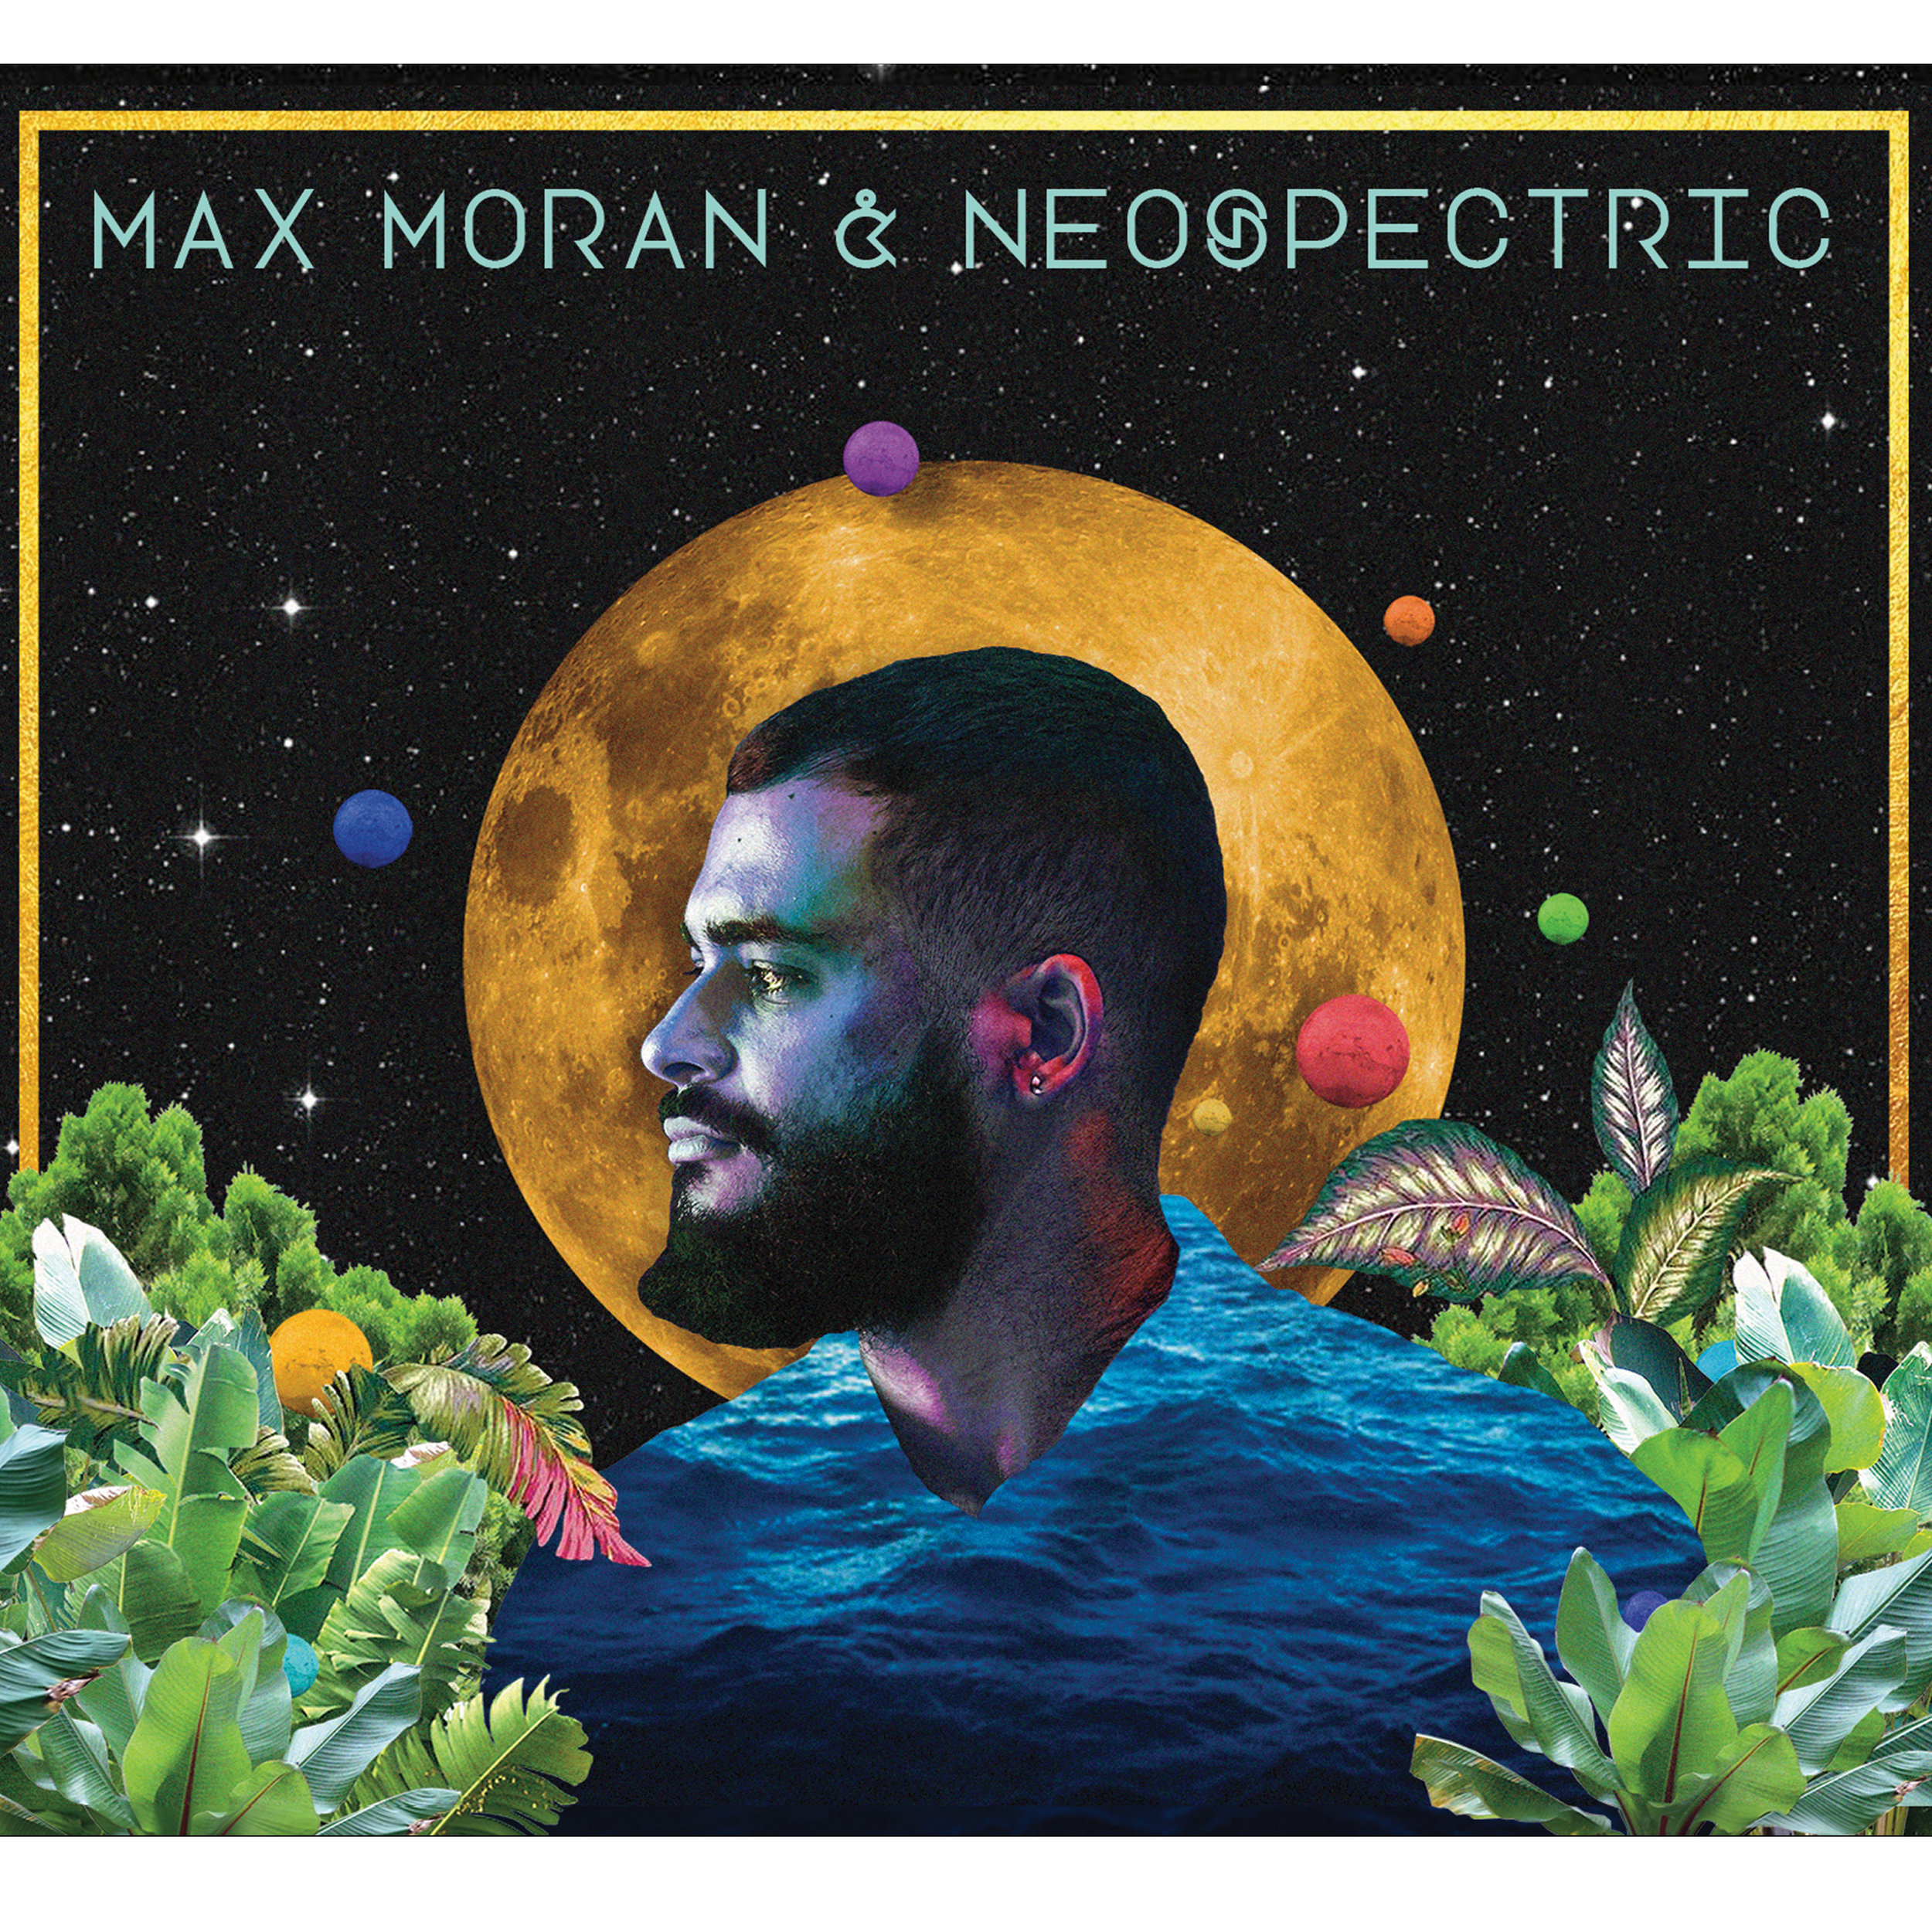 Max Moran & Neospectric - ' Neospectric '